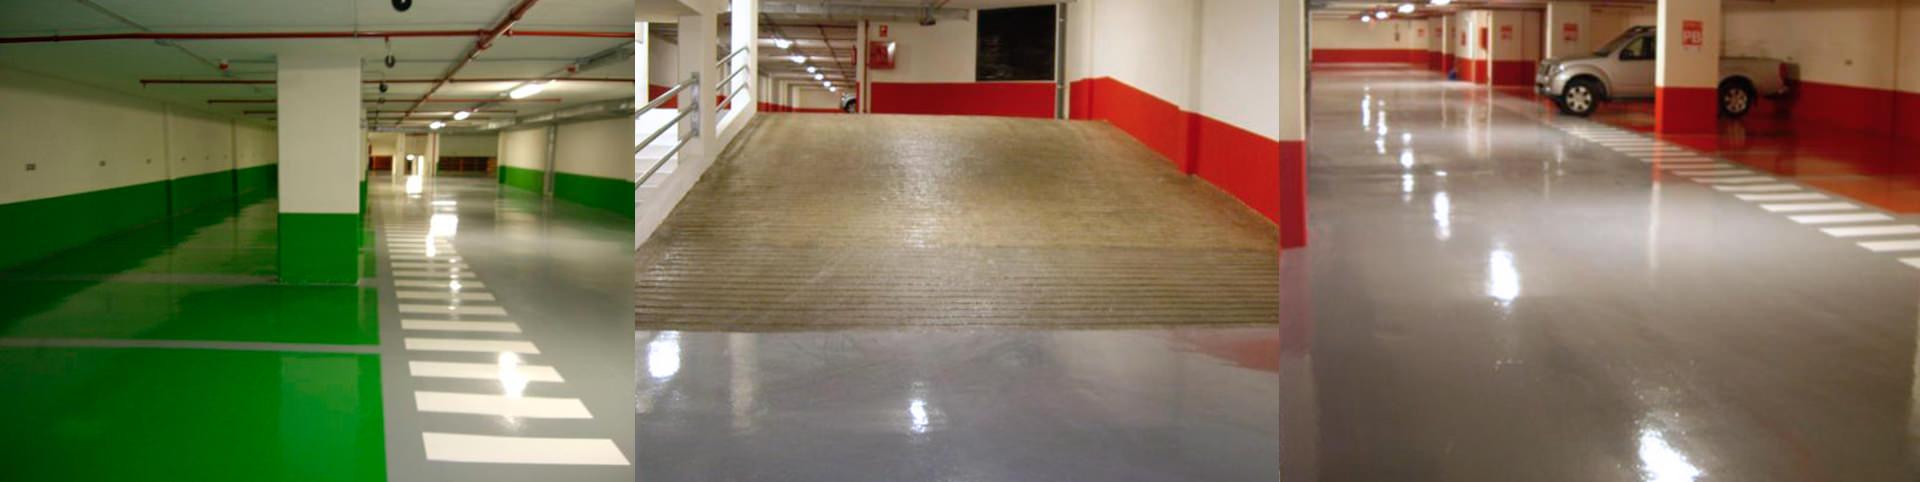 pavimento parking resina en alicante - tudepa